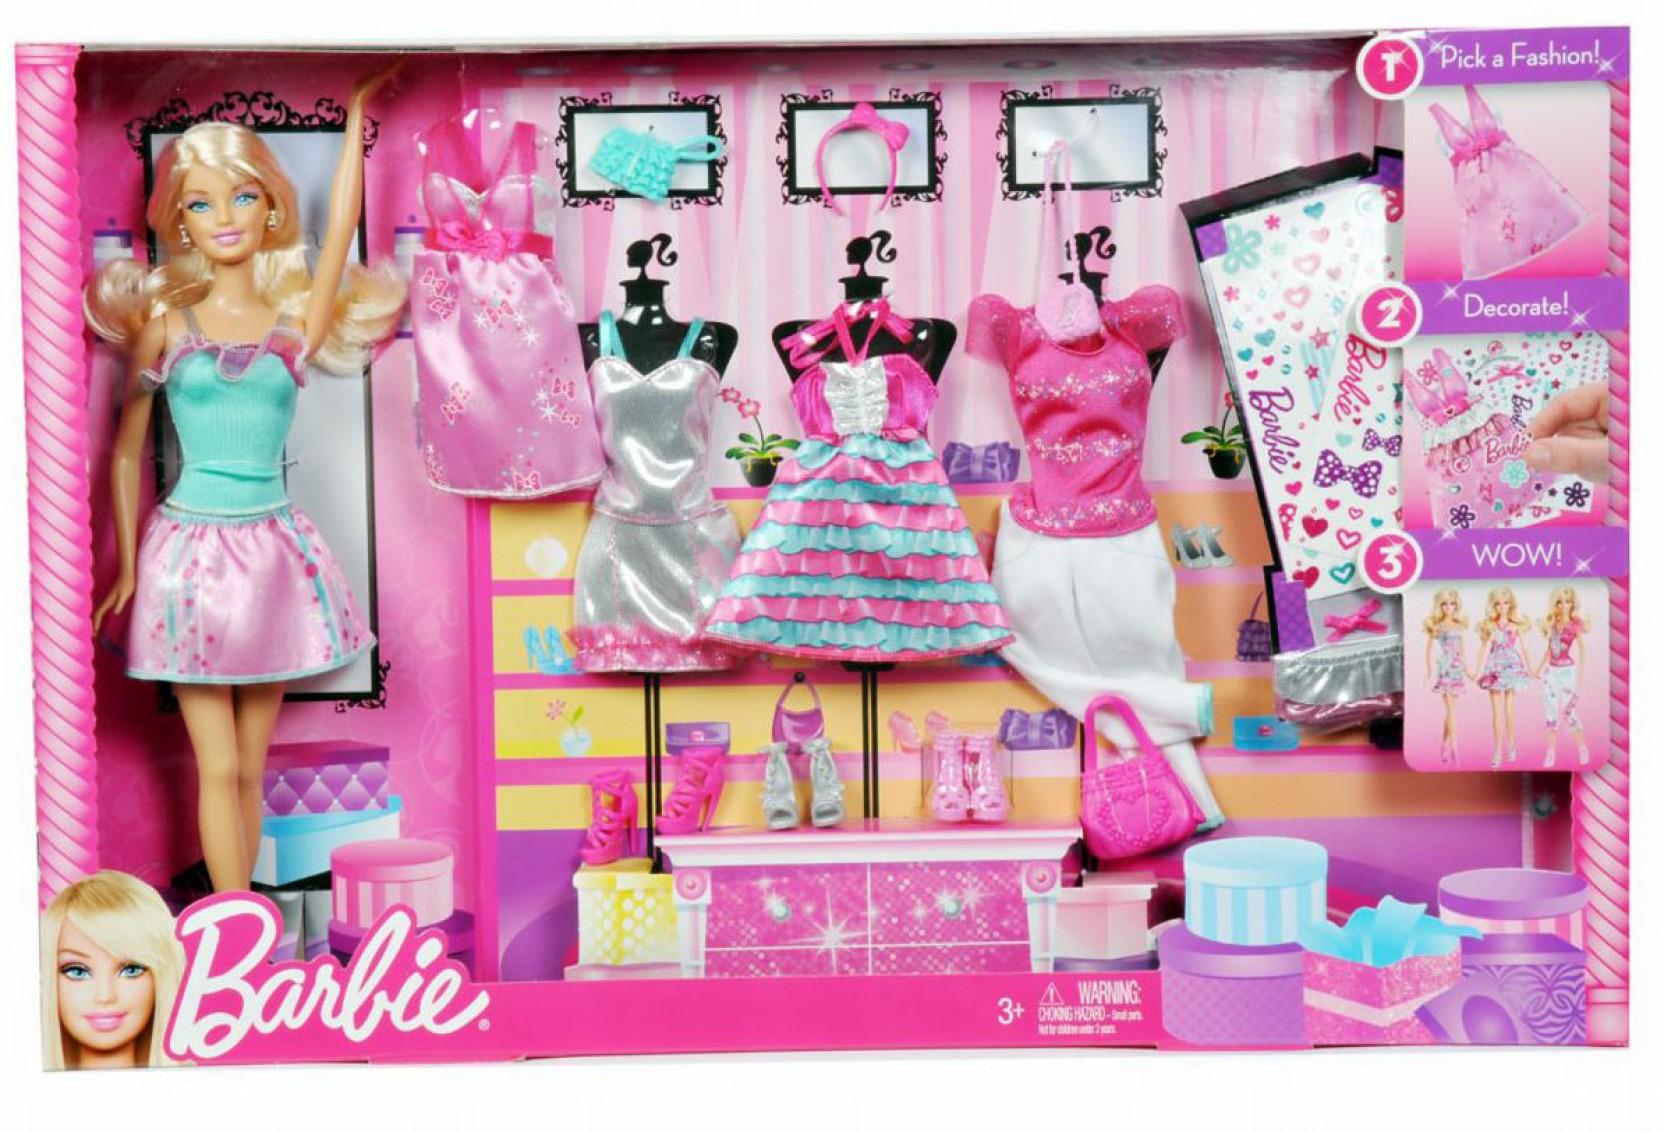 Pictures Of Barbie Doll Set Impremedia Net